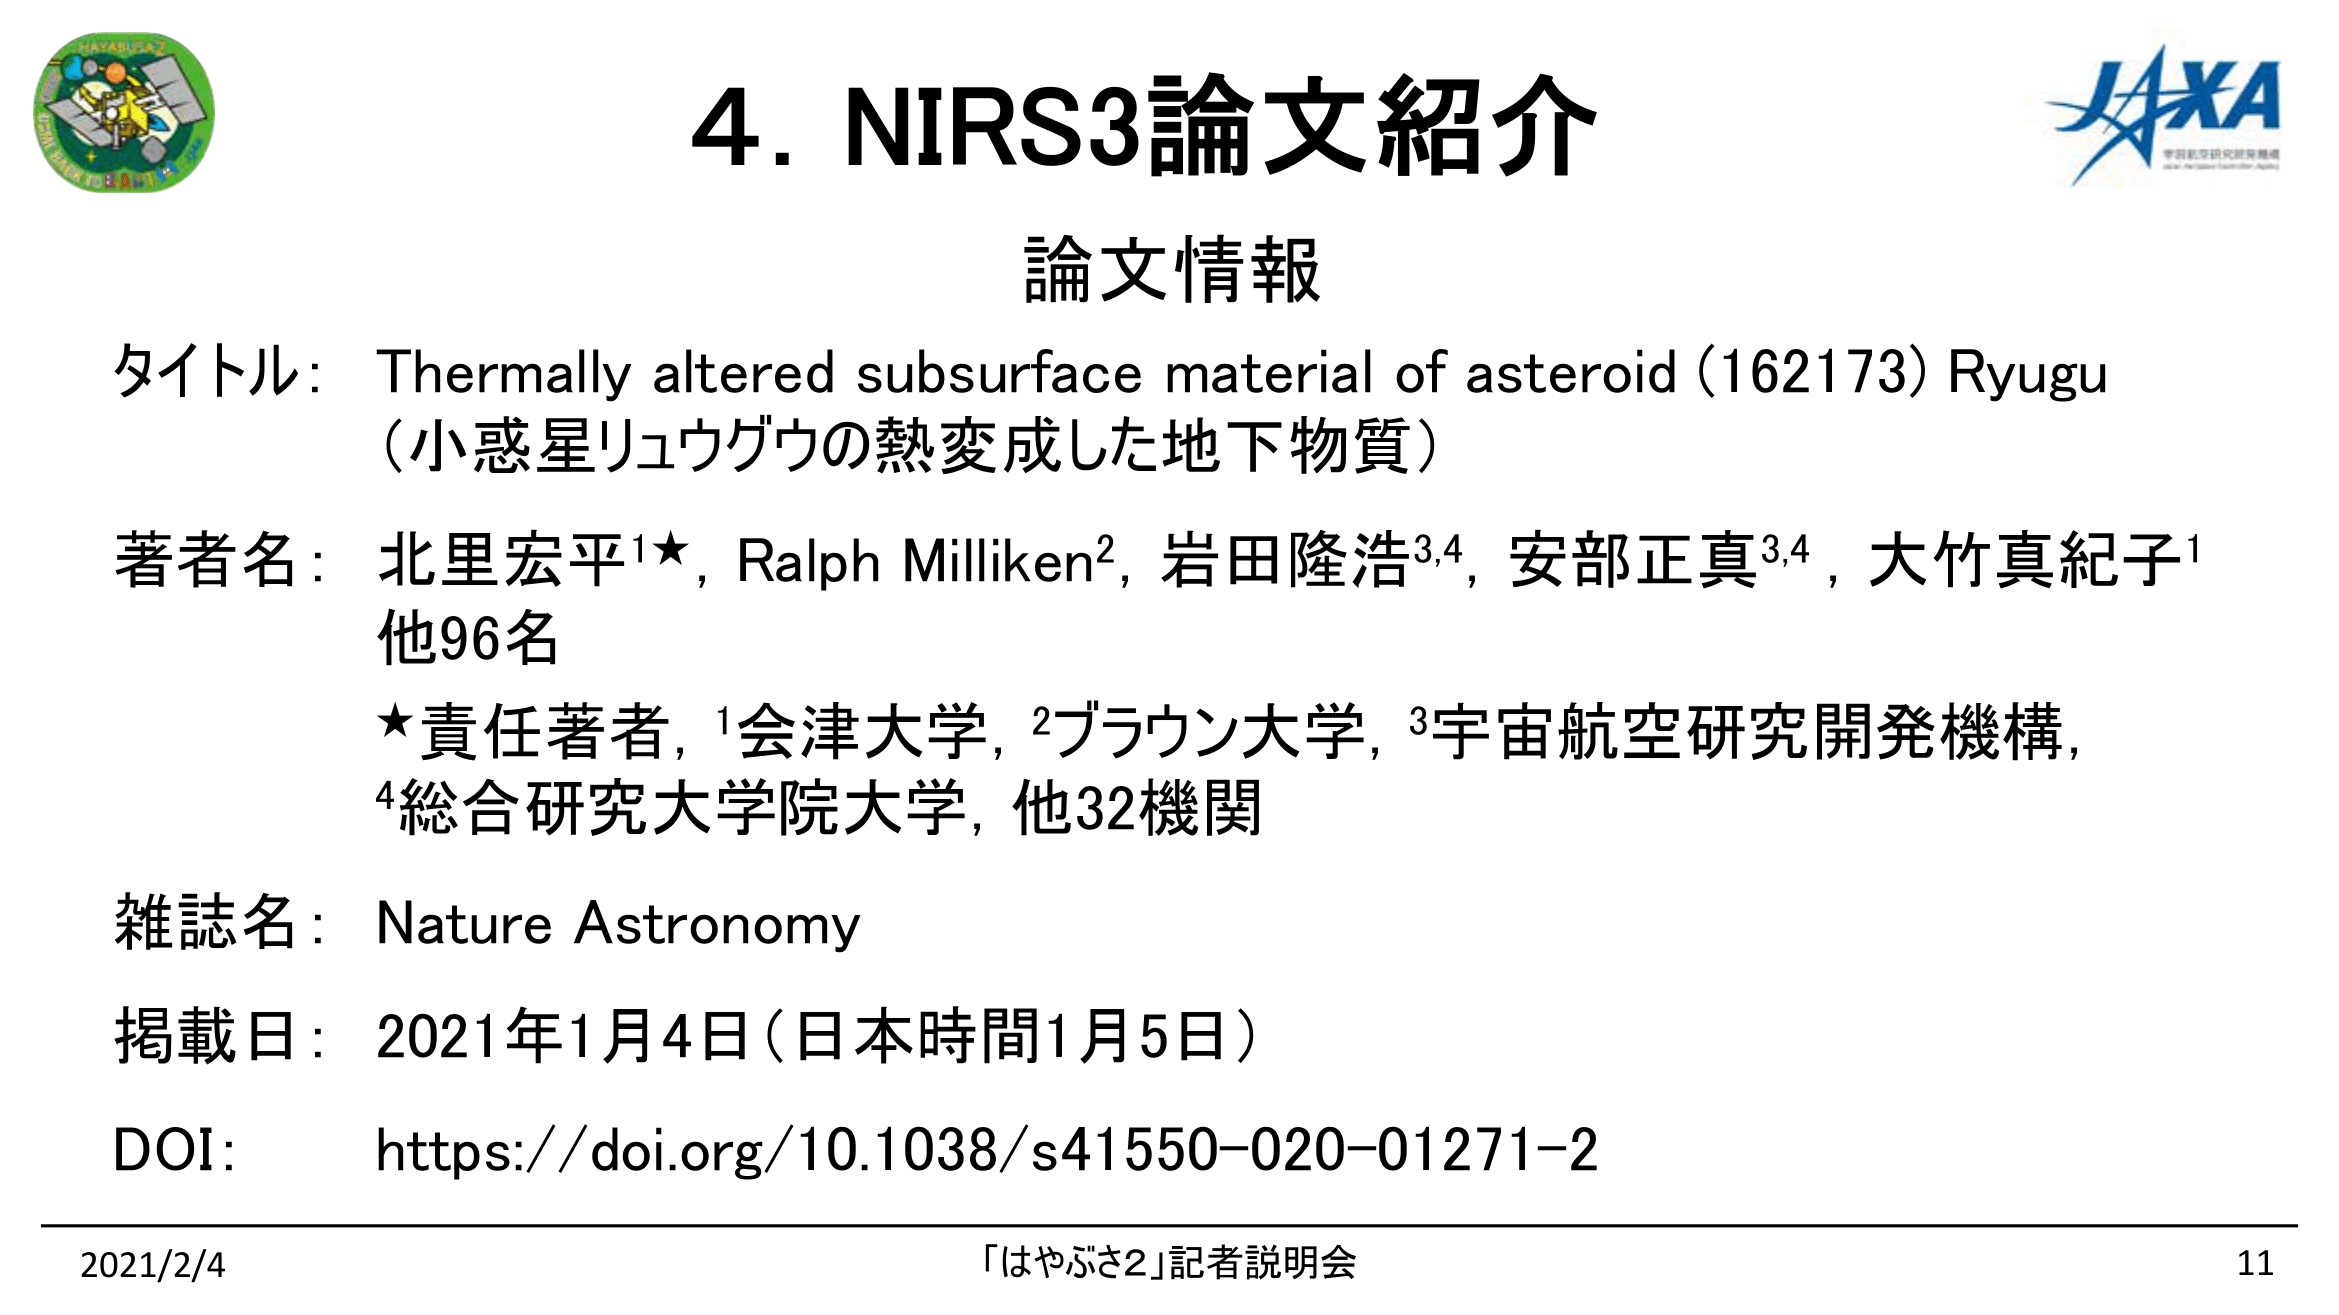 f:id:Imamura:20210204134302p:plain